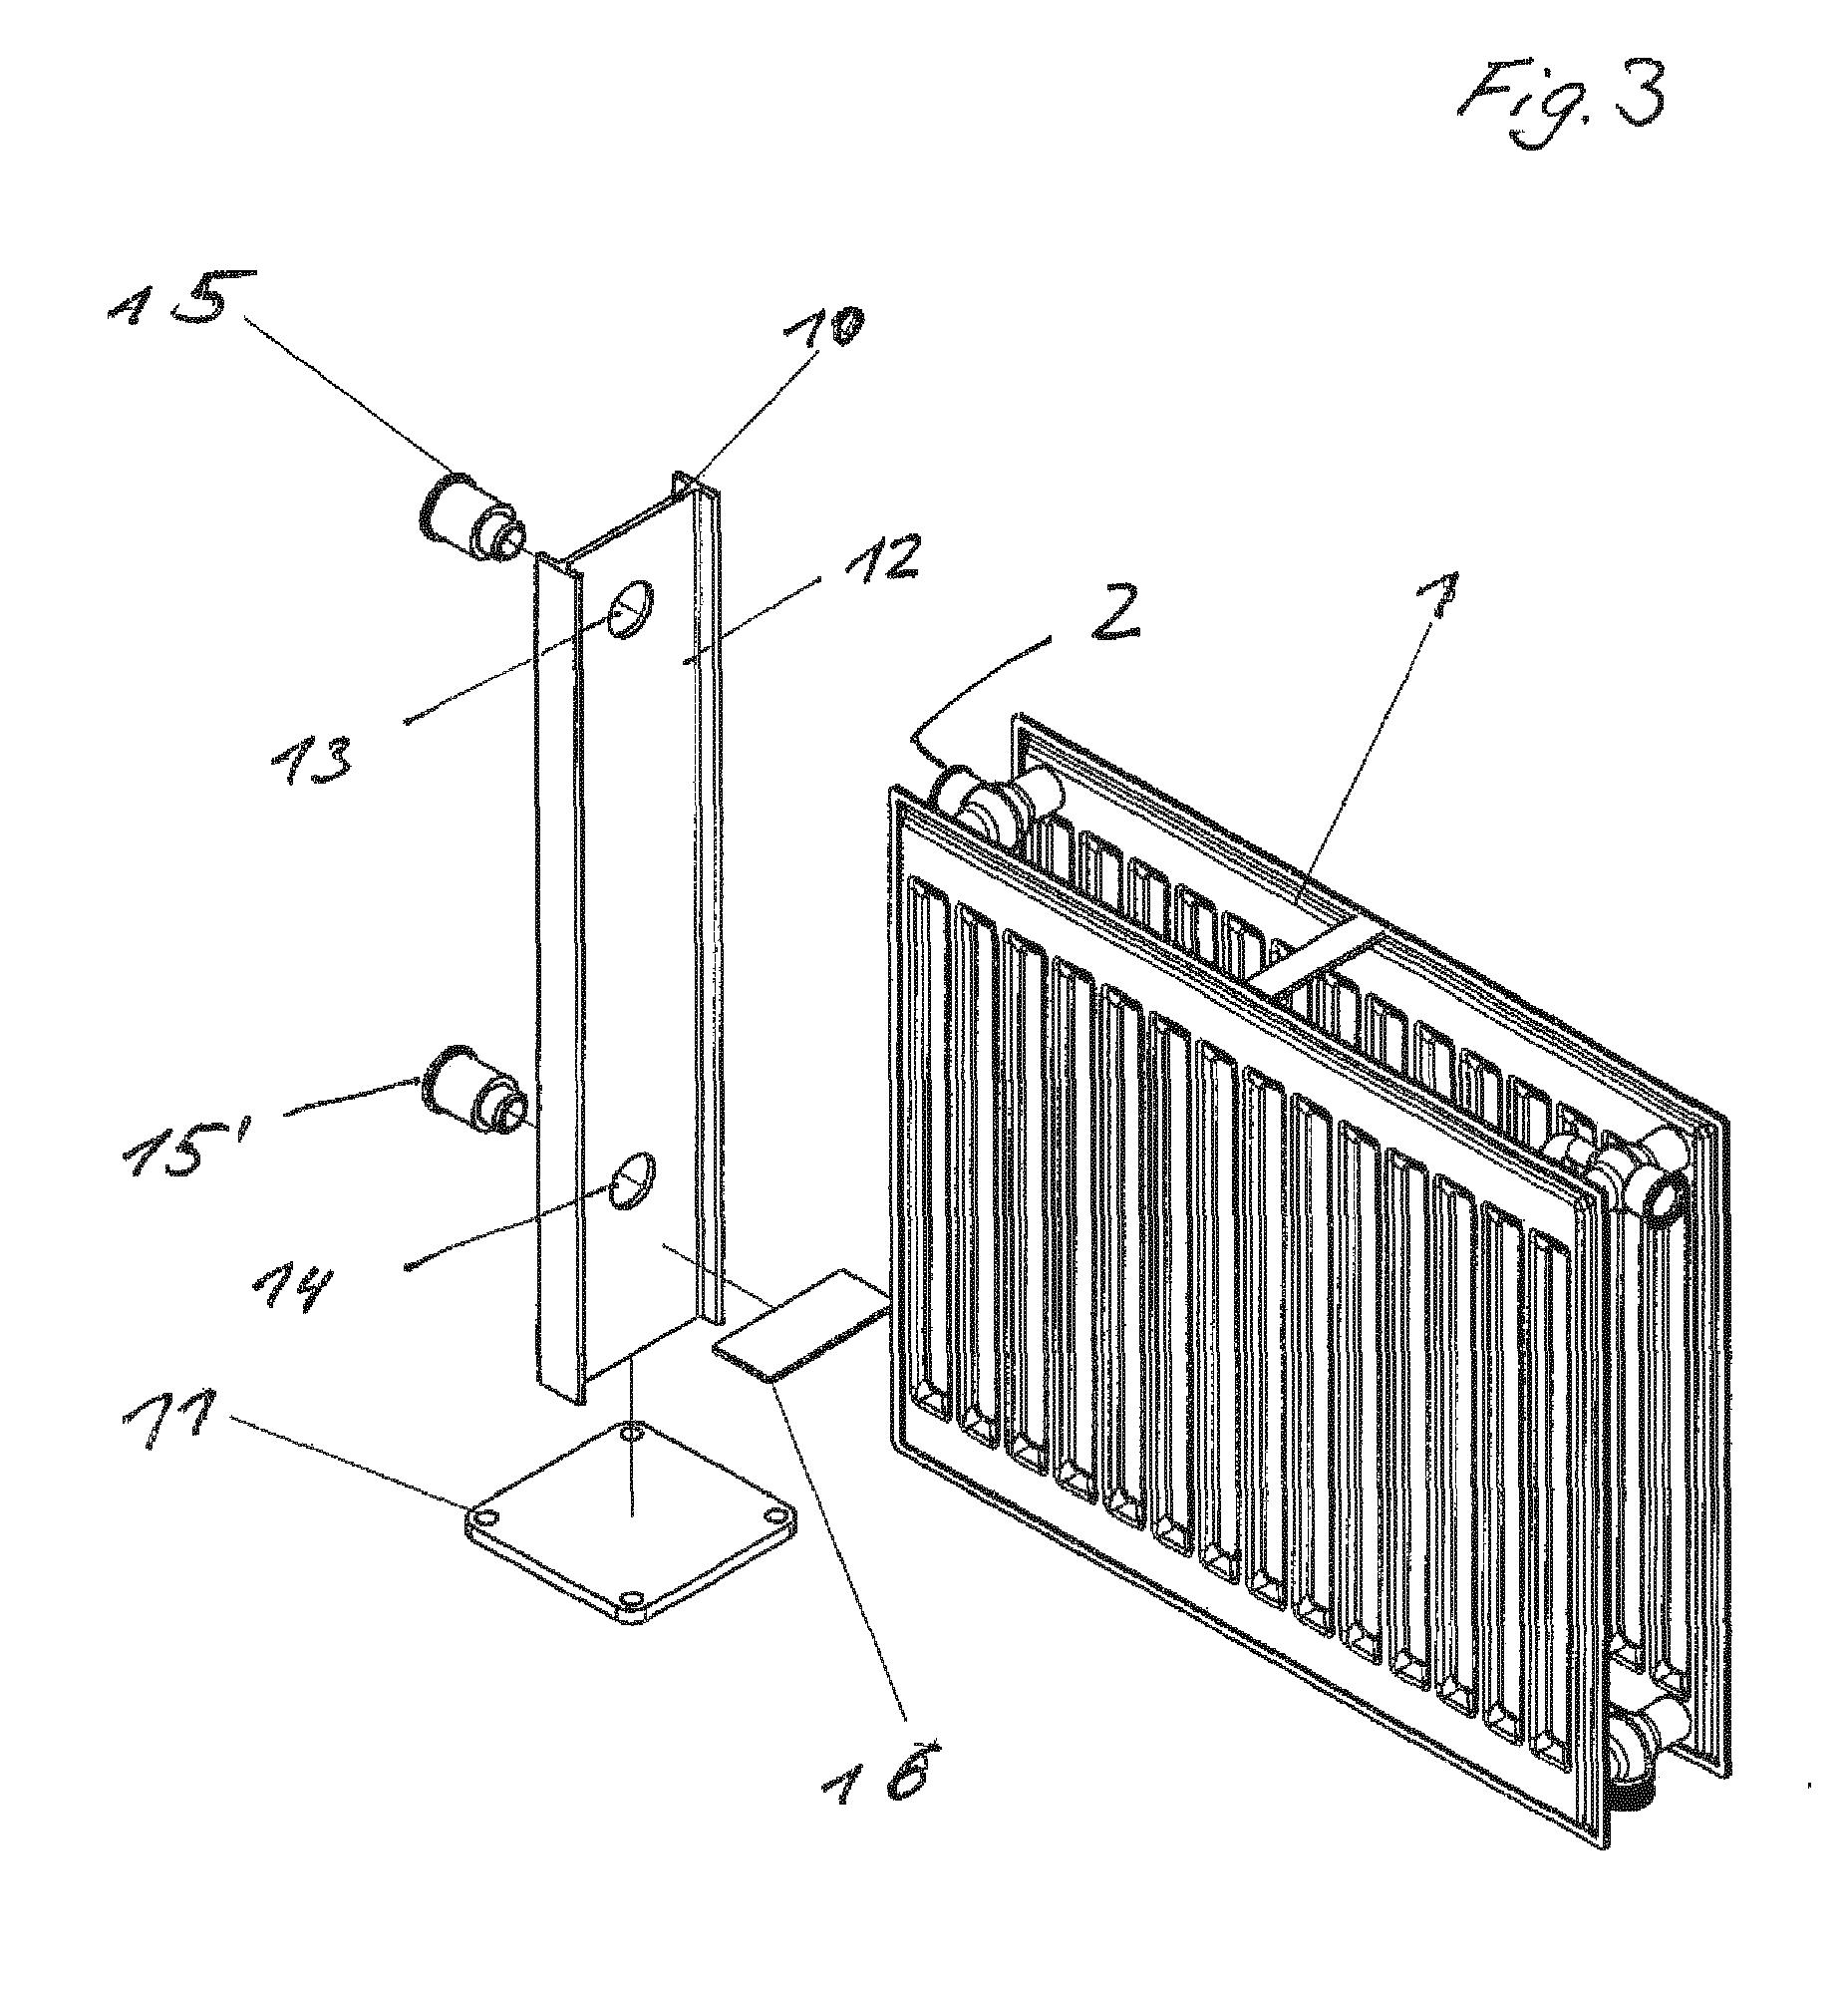 patent ep2728267a1 standkonsole f r heizk rper google patents. Black Bedroom Furniture Sets. Home Design Ideas